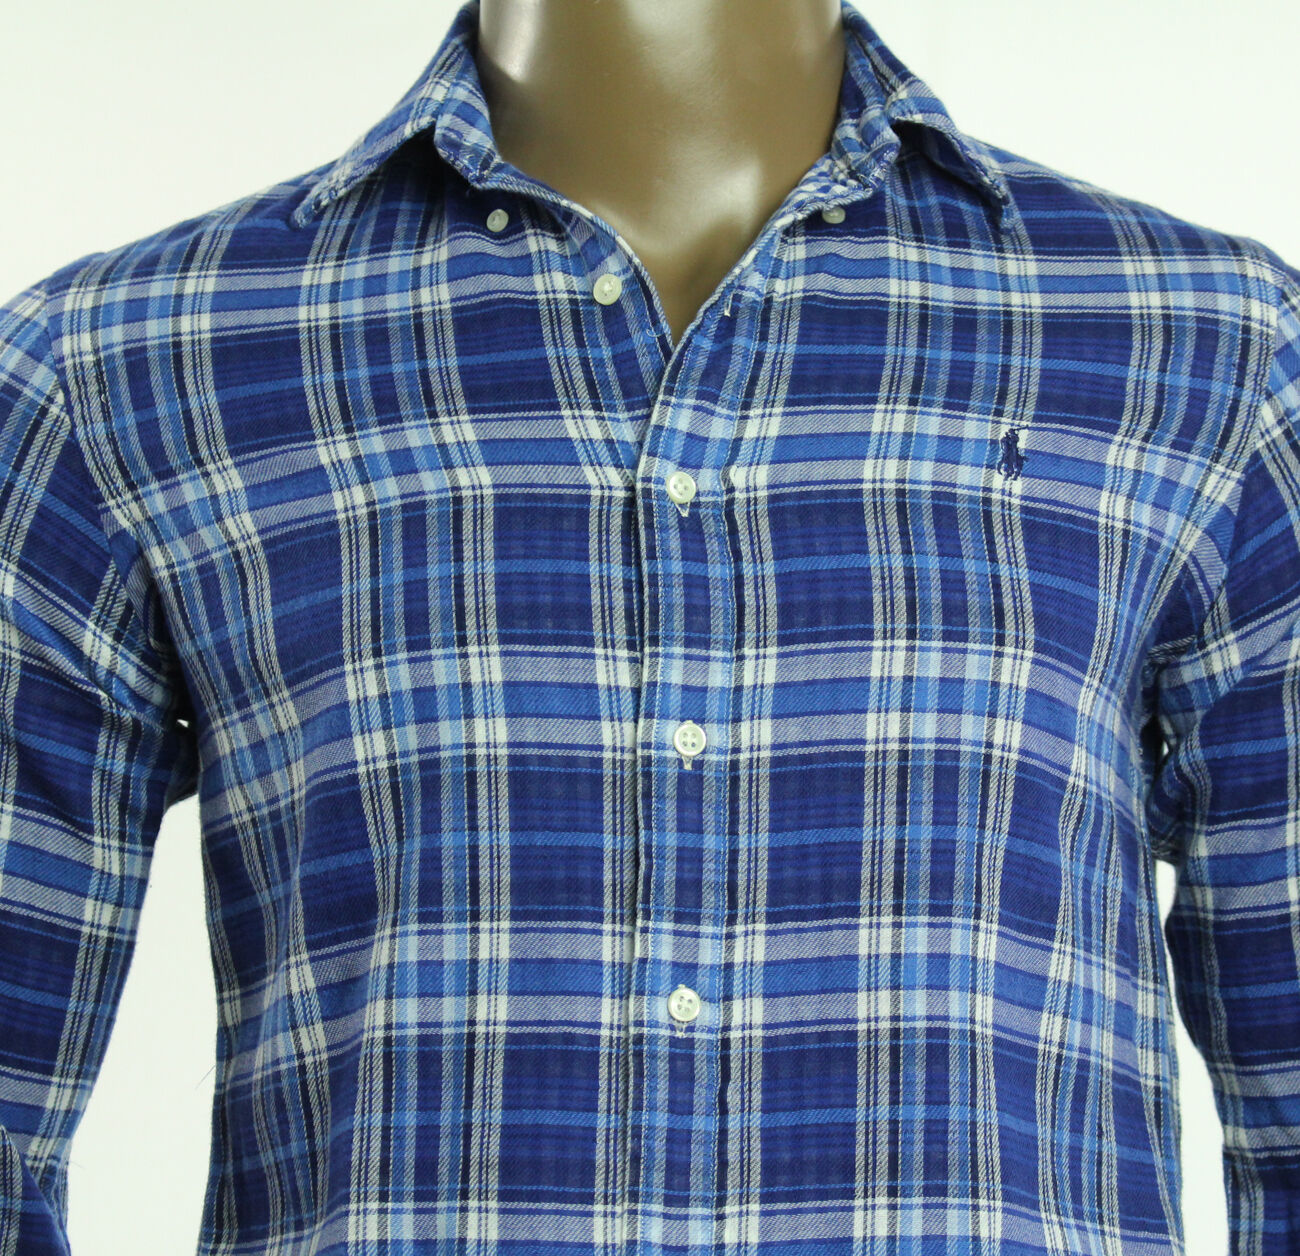 $125 New Mens Polo Ralph Lauren Royal Navy Double Faced Plaid Shirt XL